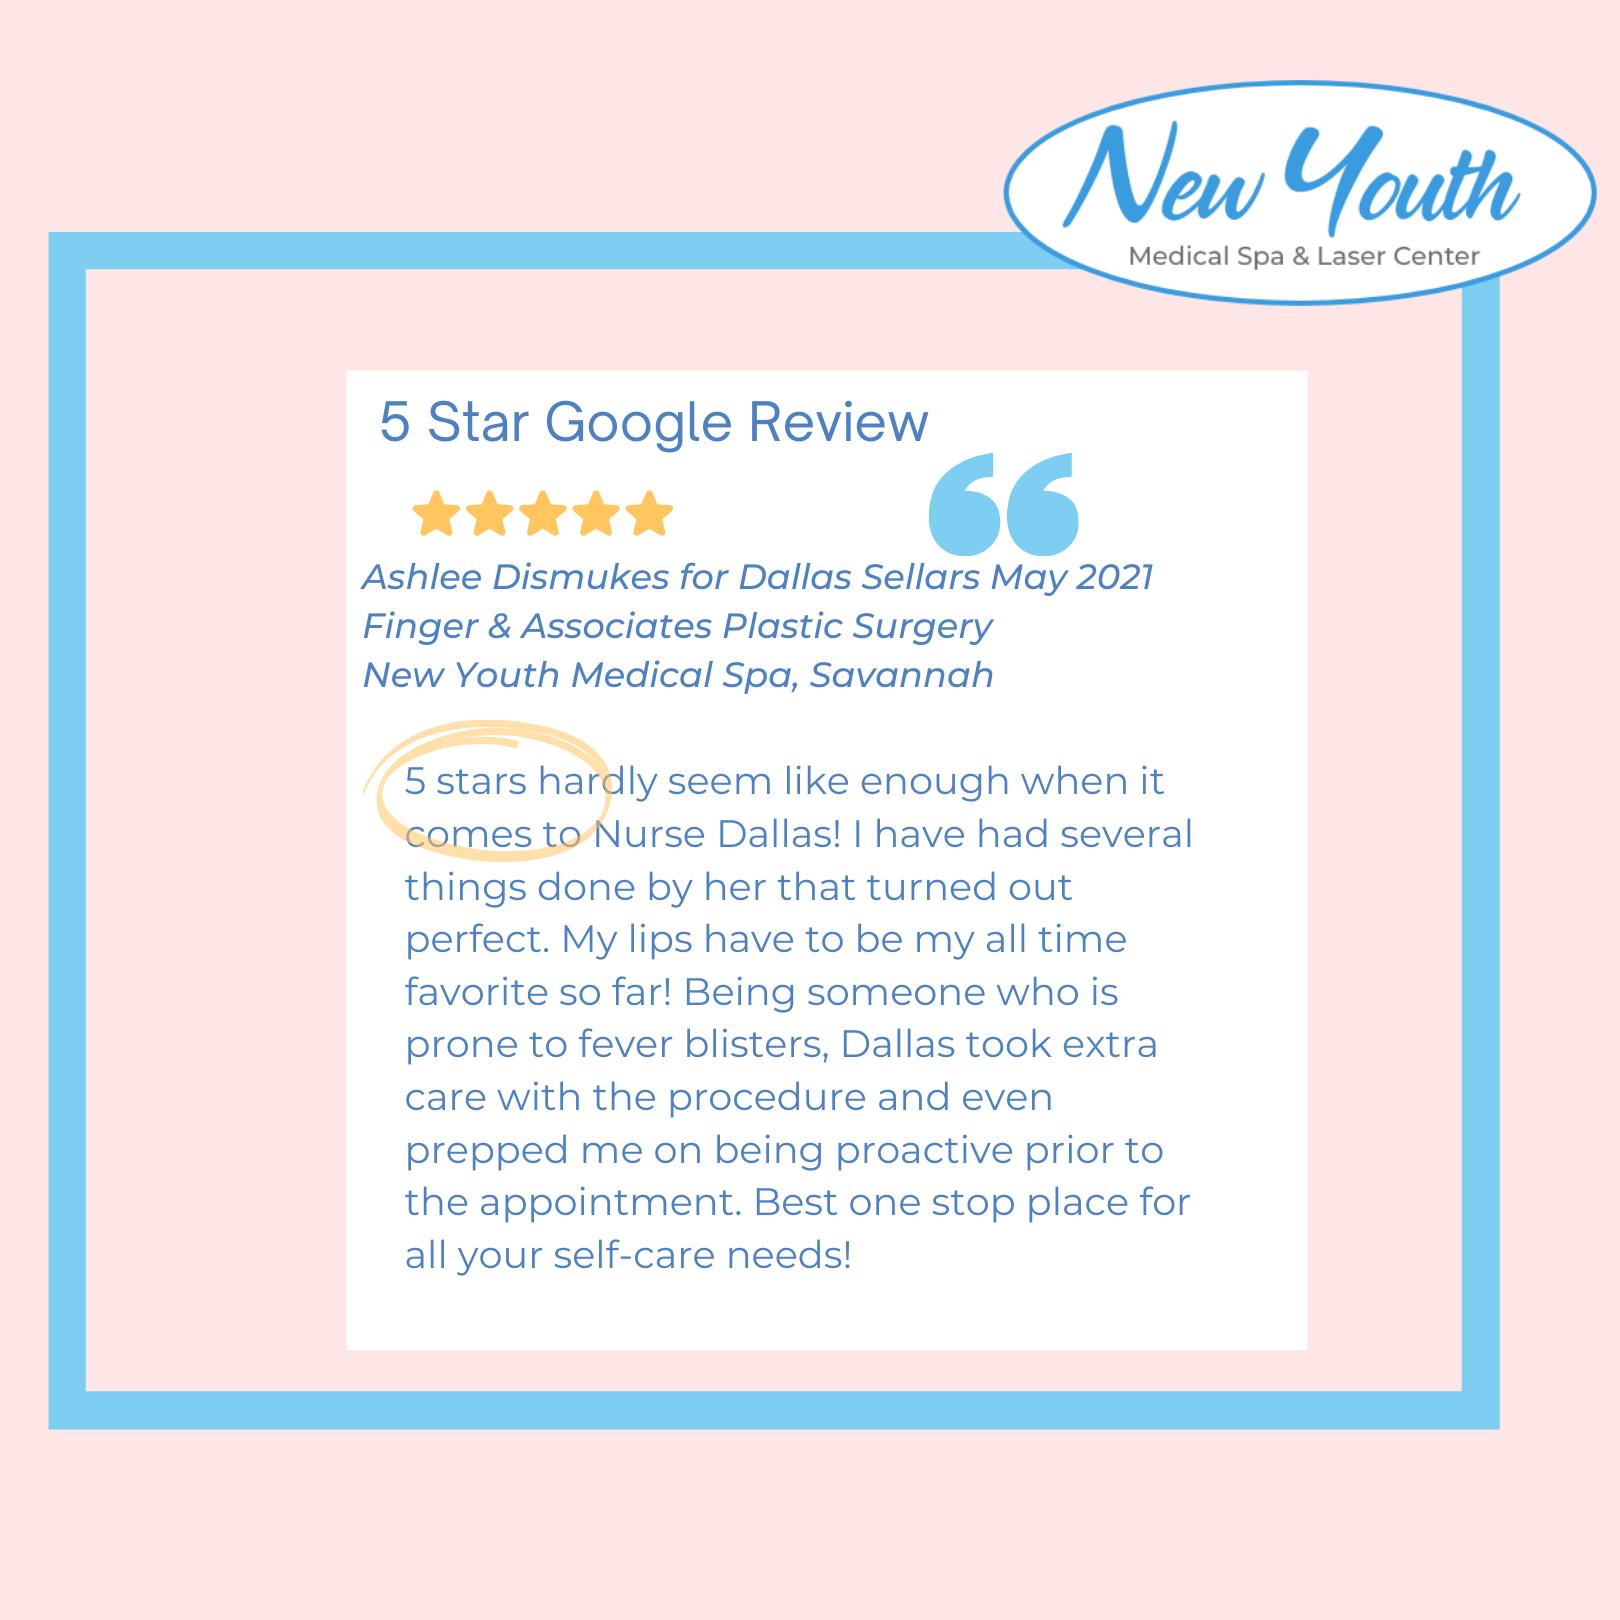 Google Review For Nurse Injector Dallas Sellars